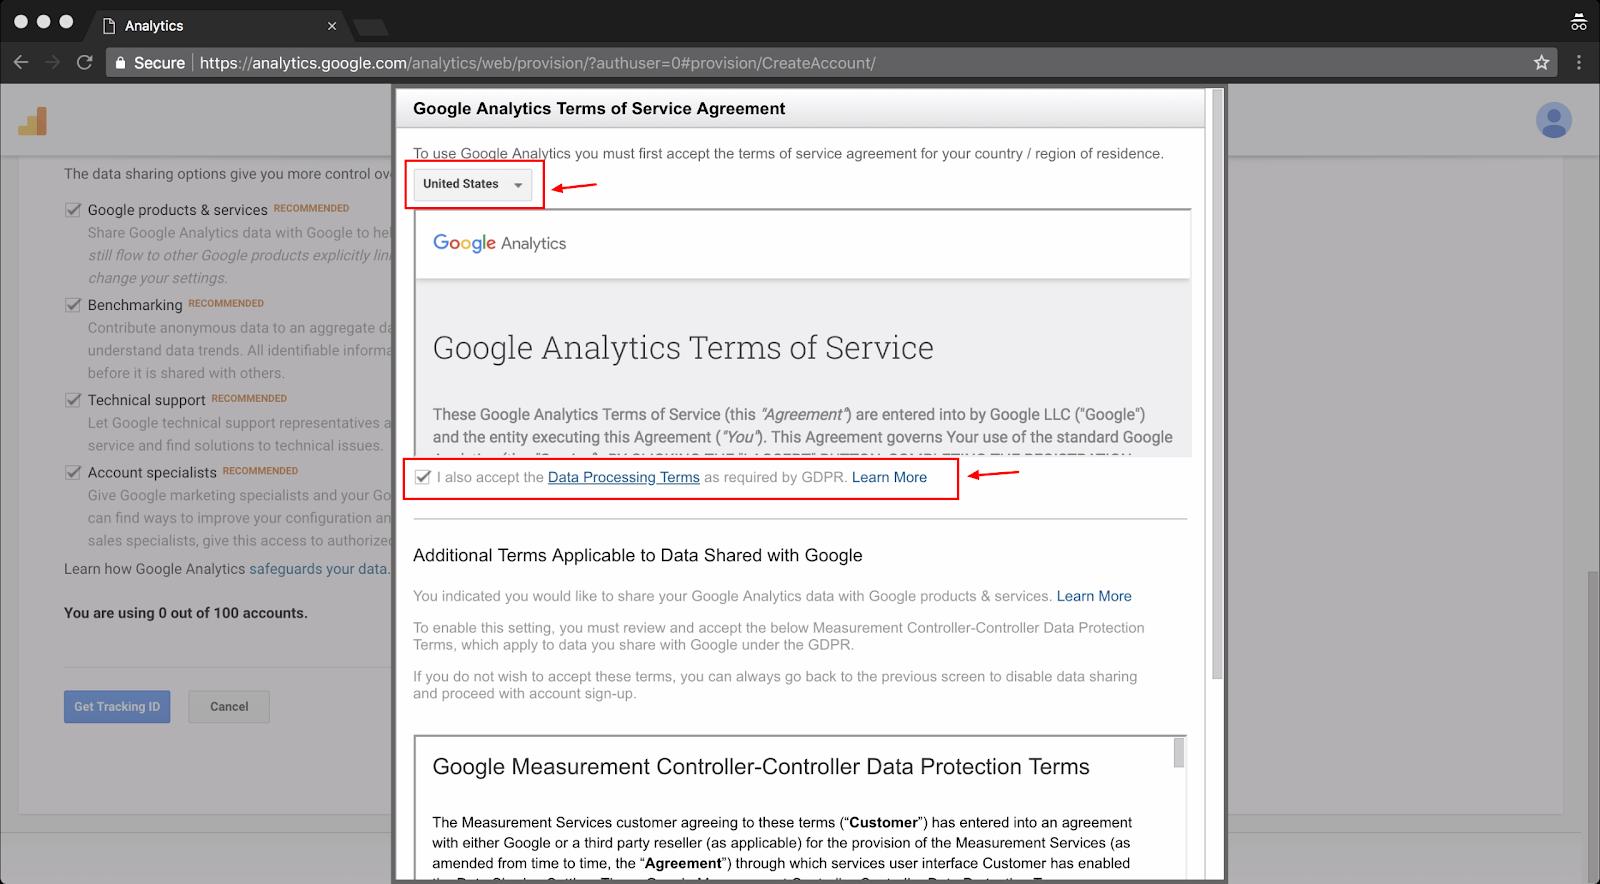 Screenshot showing google analytics terms